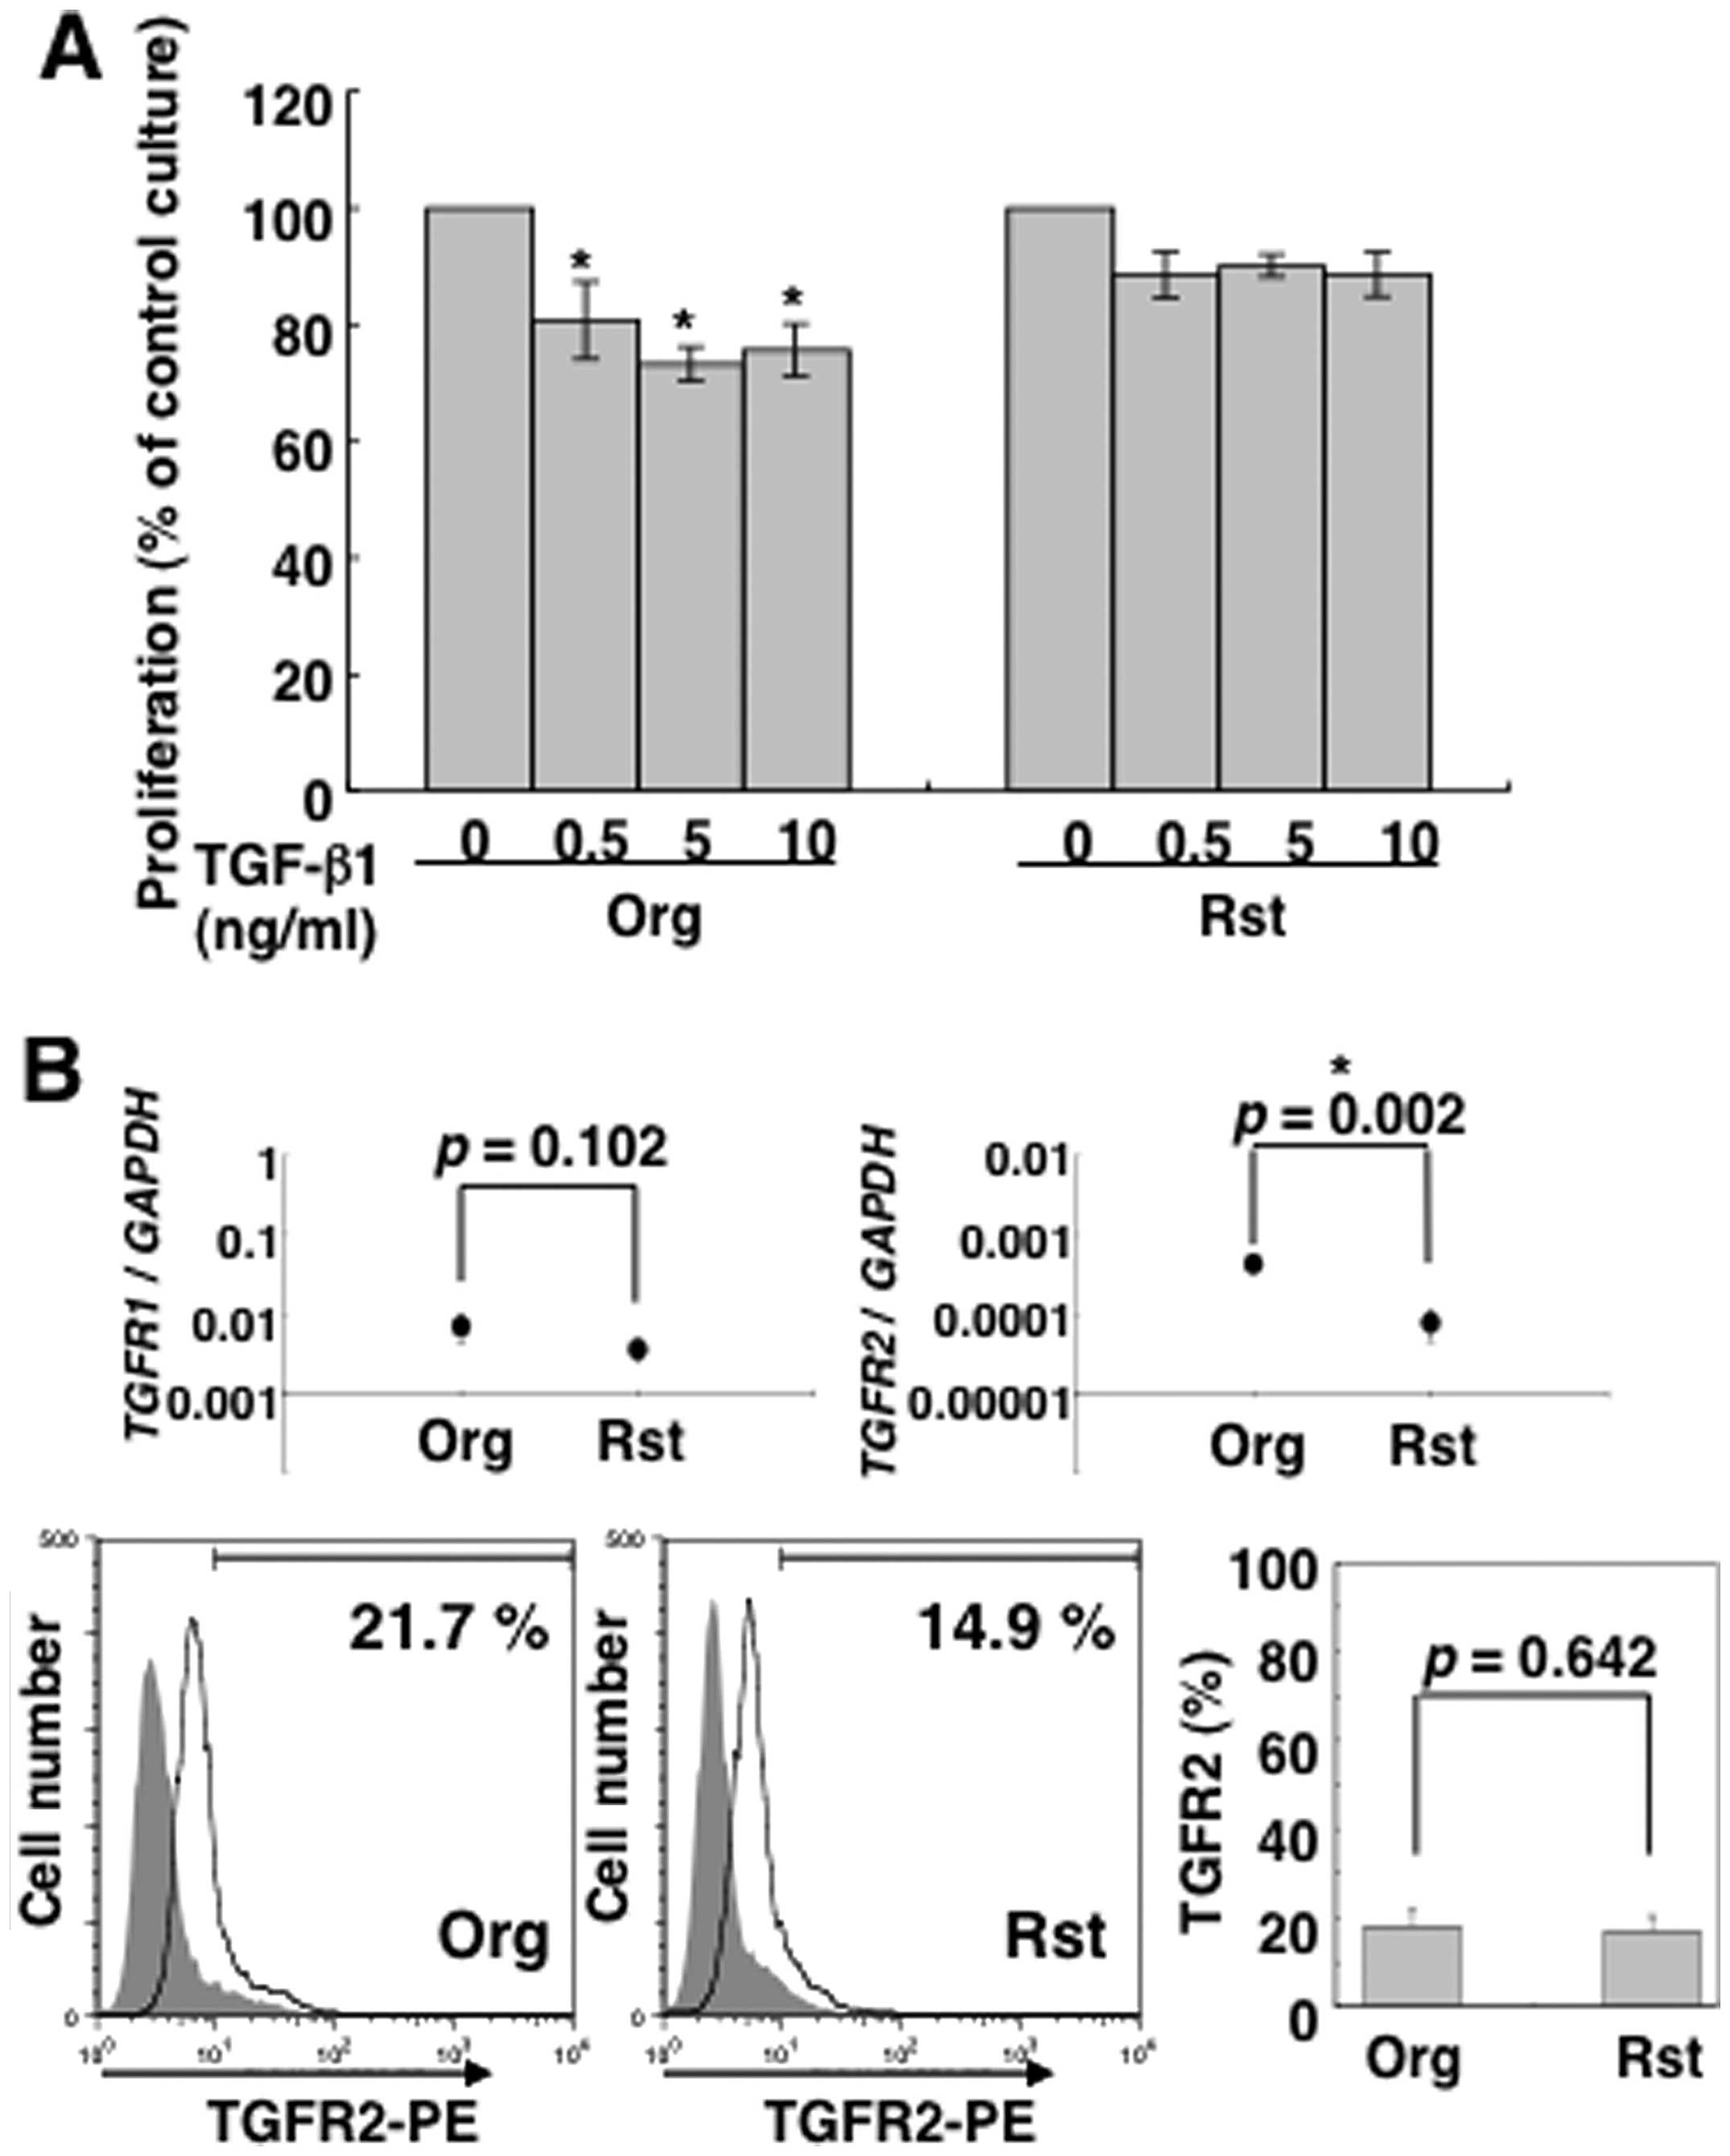 Chronic exposure to asbestos enhances TGF-β1 production in